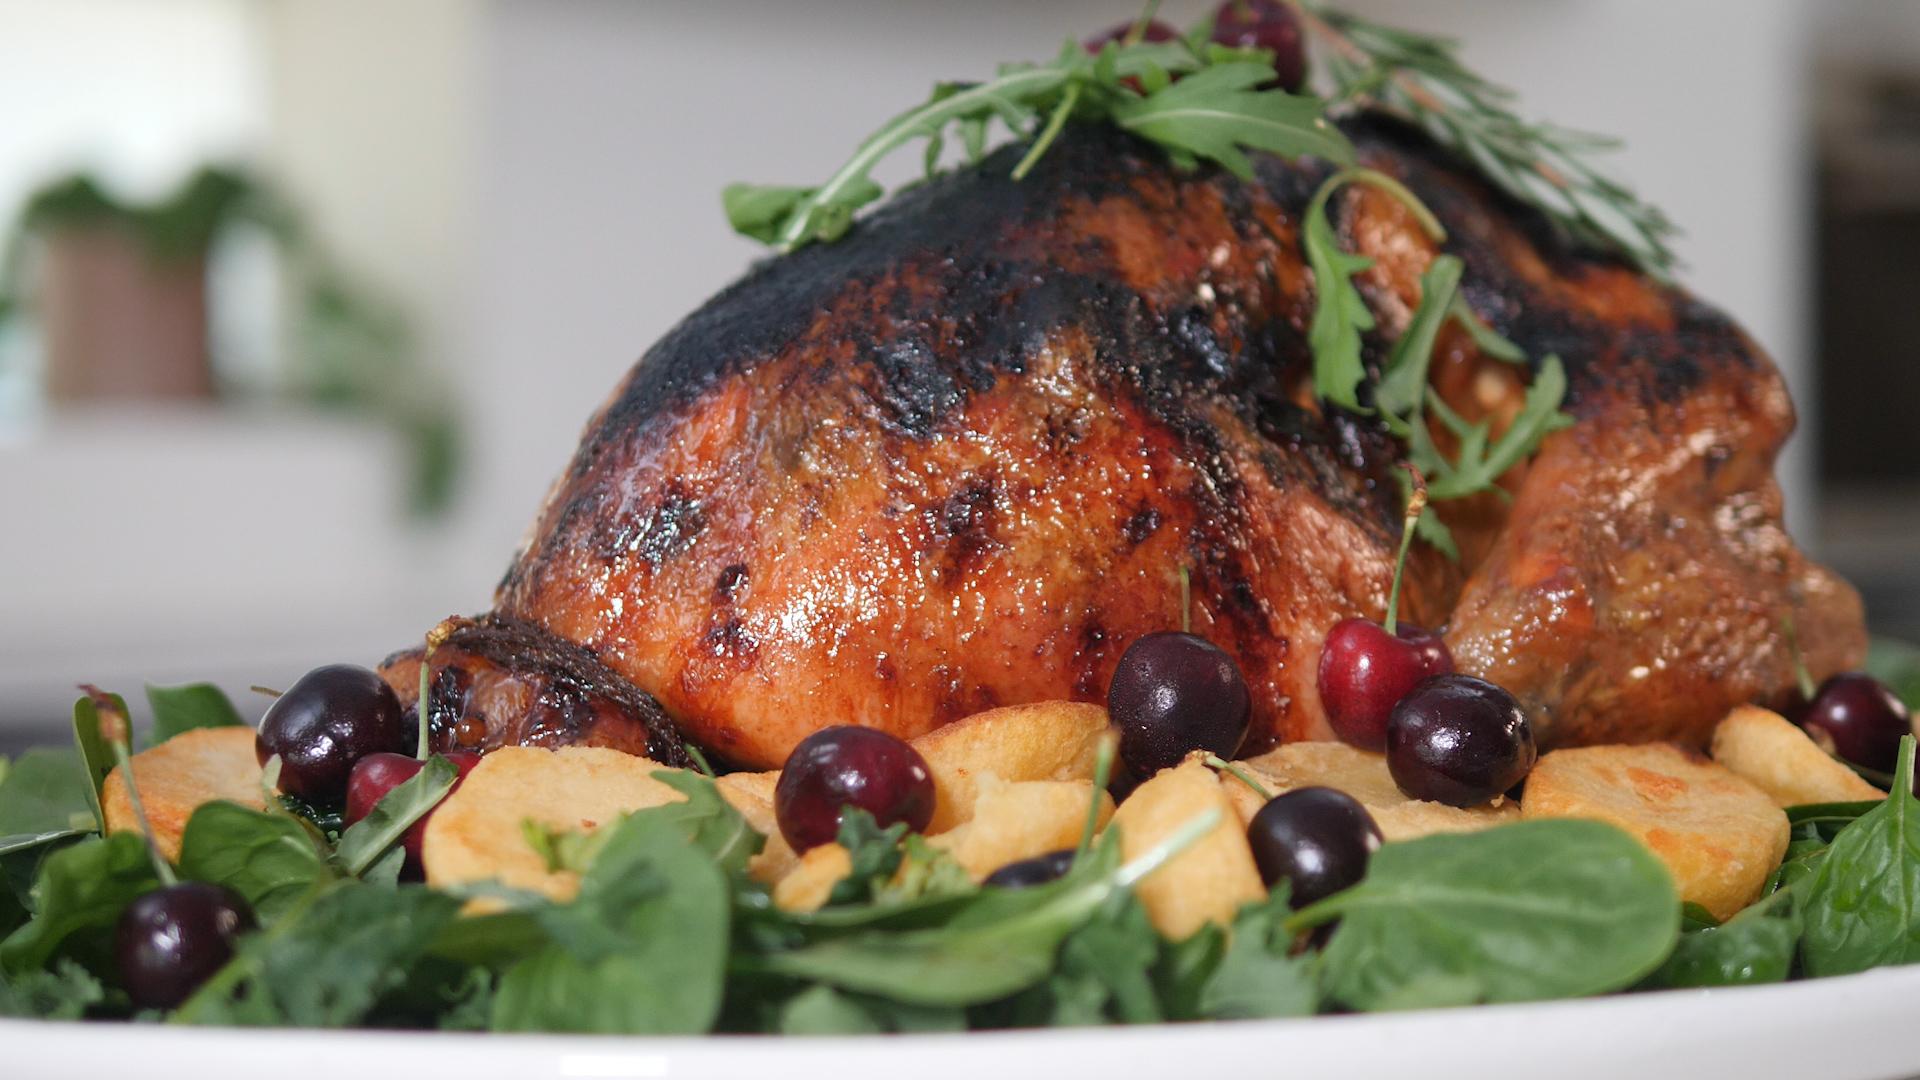 How to cook and Coca-Cola glaze a whole Christmas turkey